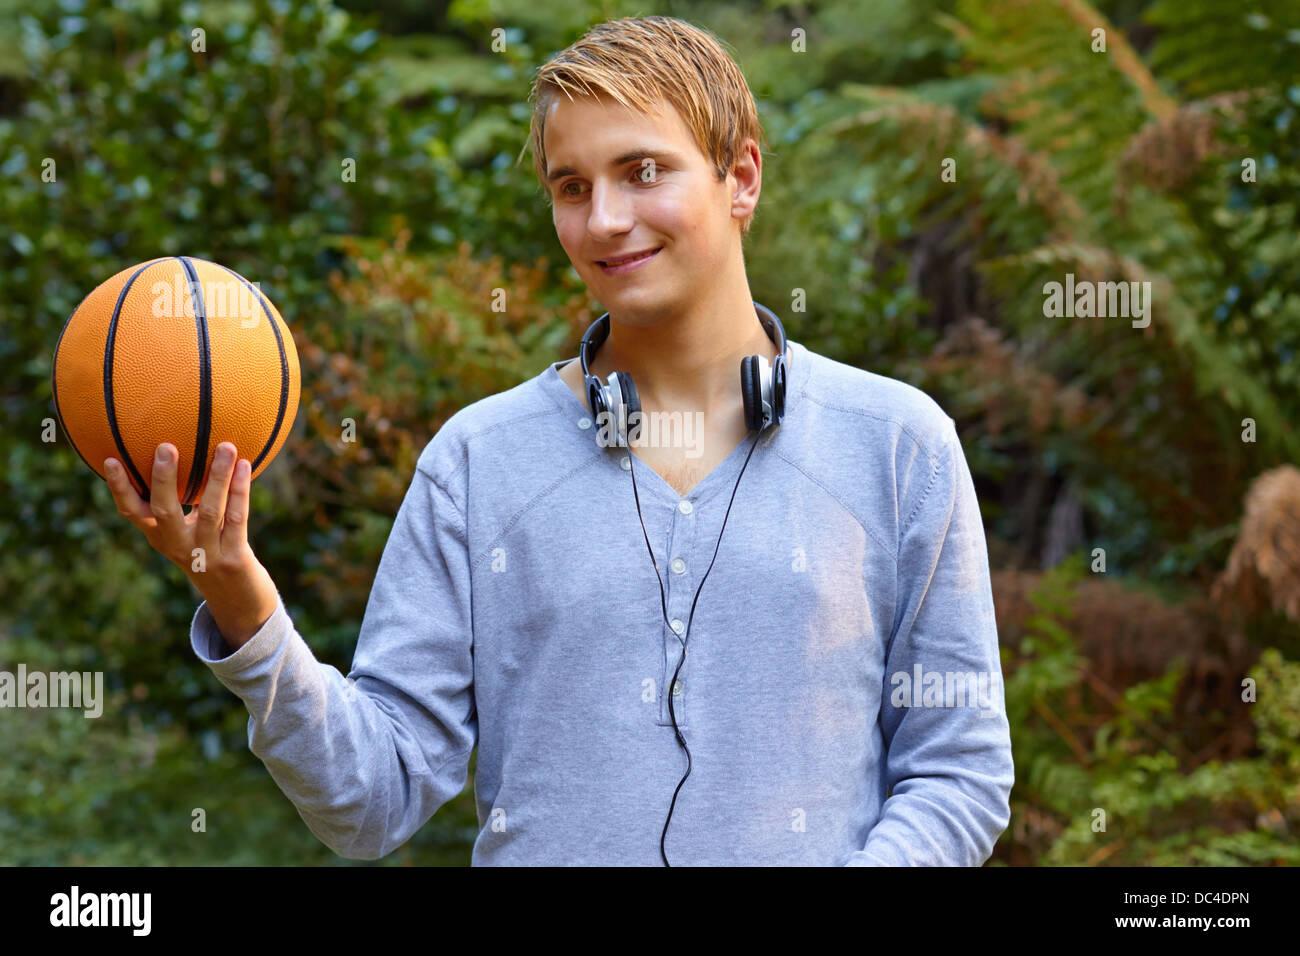 Giovane uomo contemplando outdoor sport basket Immagini Stock